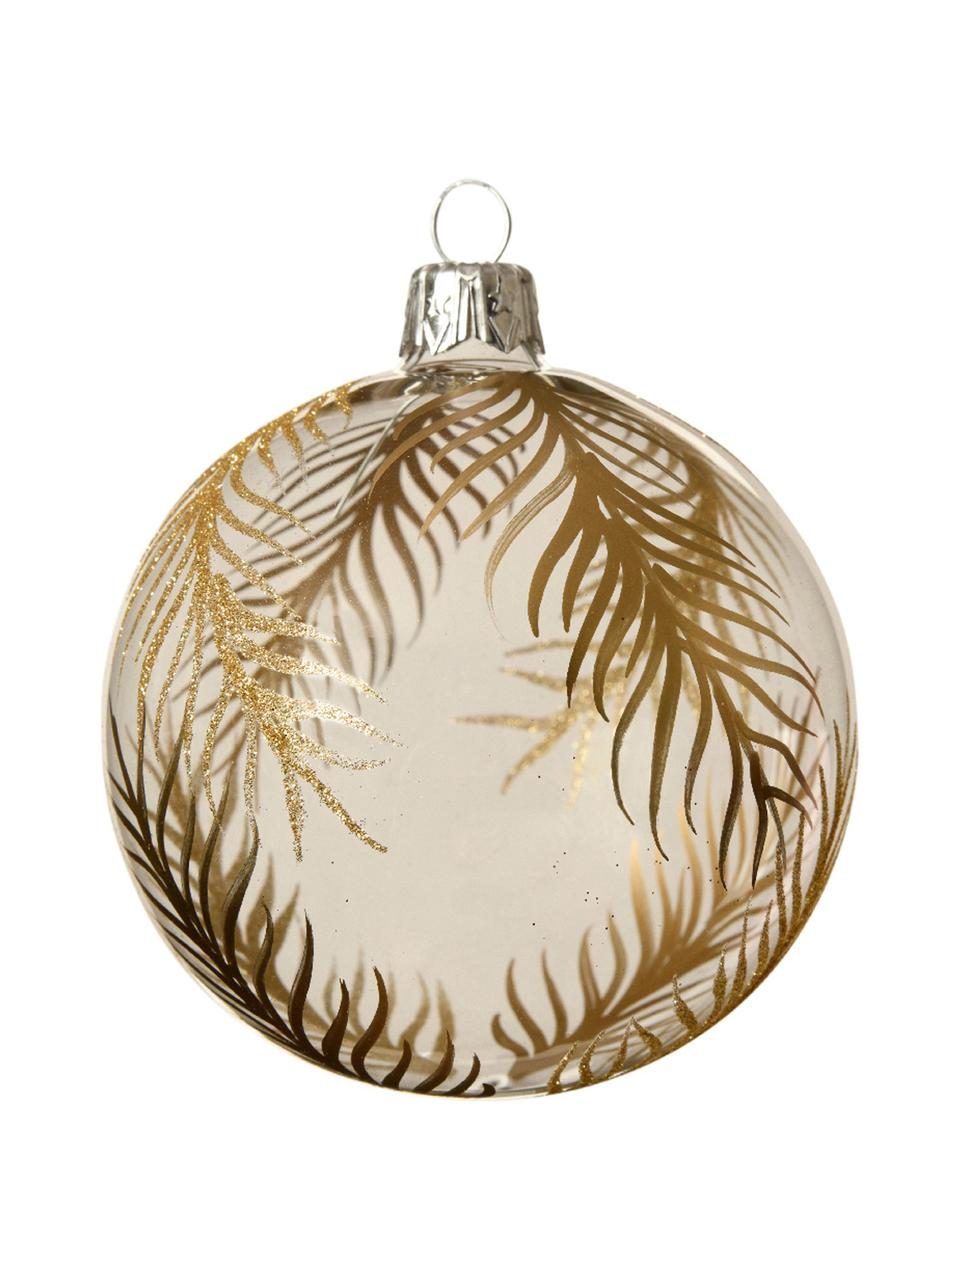 Palla di Natale Gold Leaves Ø 8 cm, 2 pz, Trasparente, dorato, Ø 8 cm